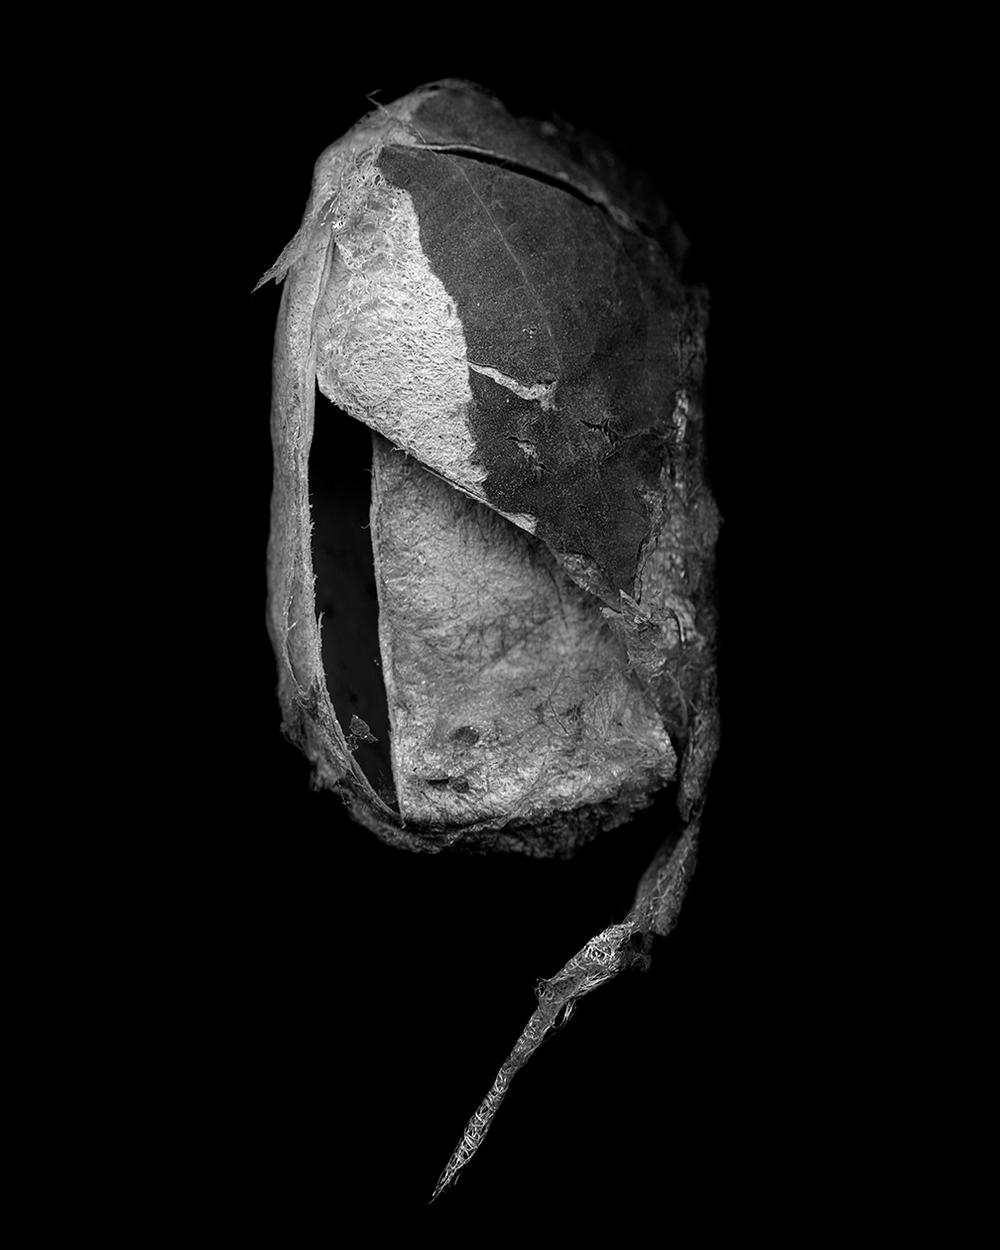 Antheraea Polyphemus Cocoon I (2014)